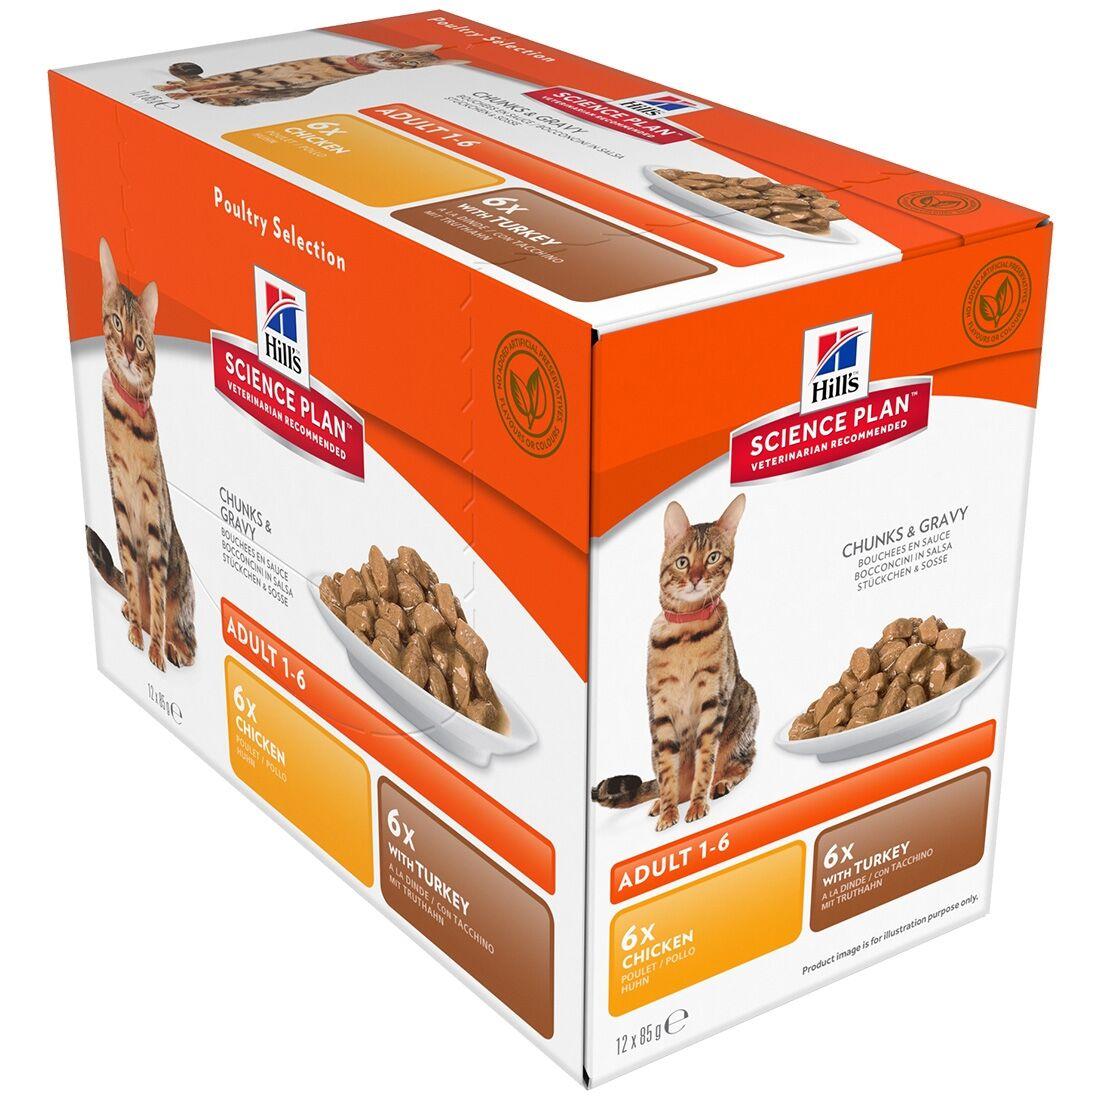 Hill's Science Plan Sachets repas Hill's Science Plan Adult Contenance : 12 sachets de 85 g, Saveur : 6 x Chicken + 6 x Turkey